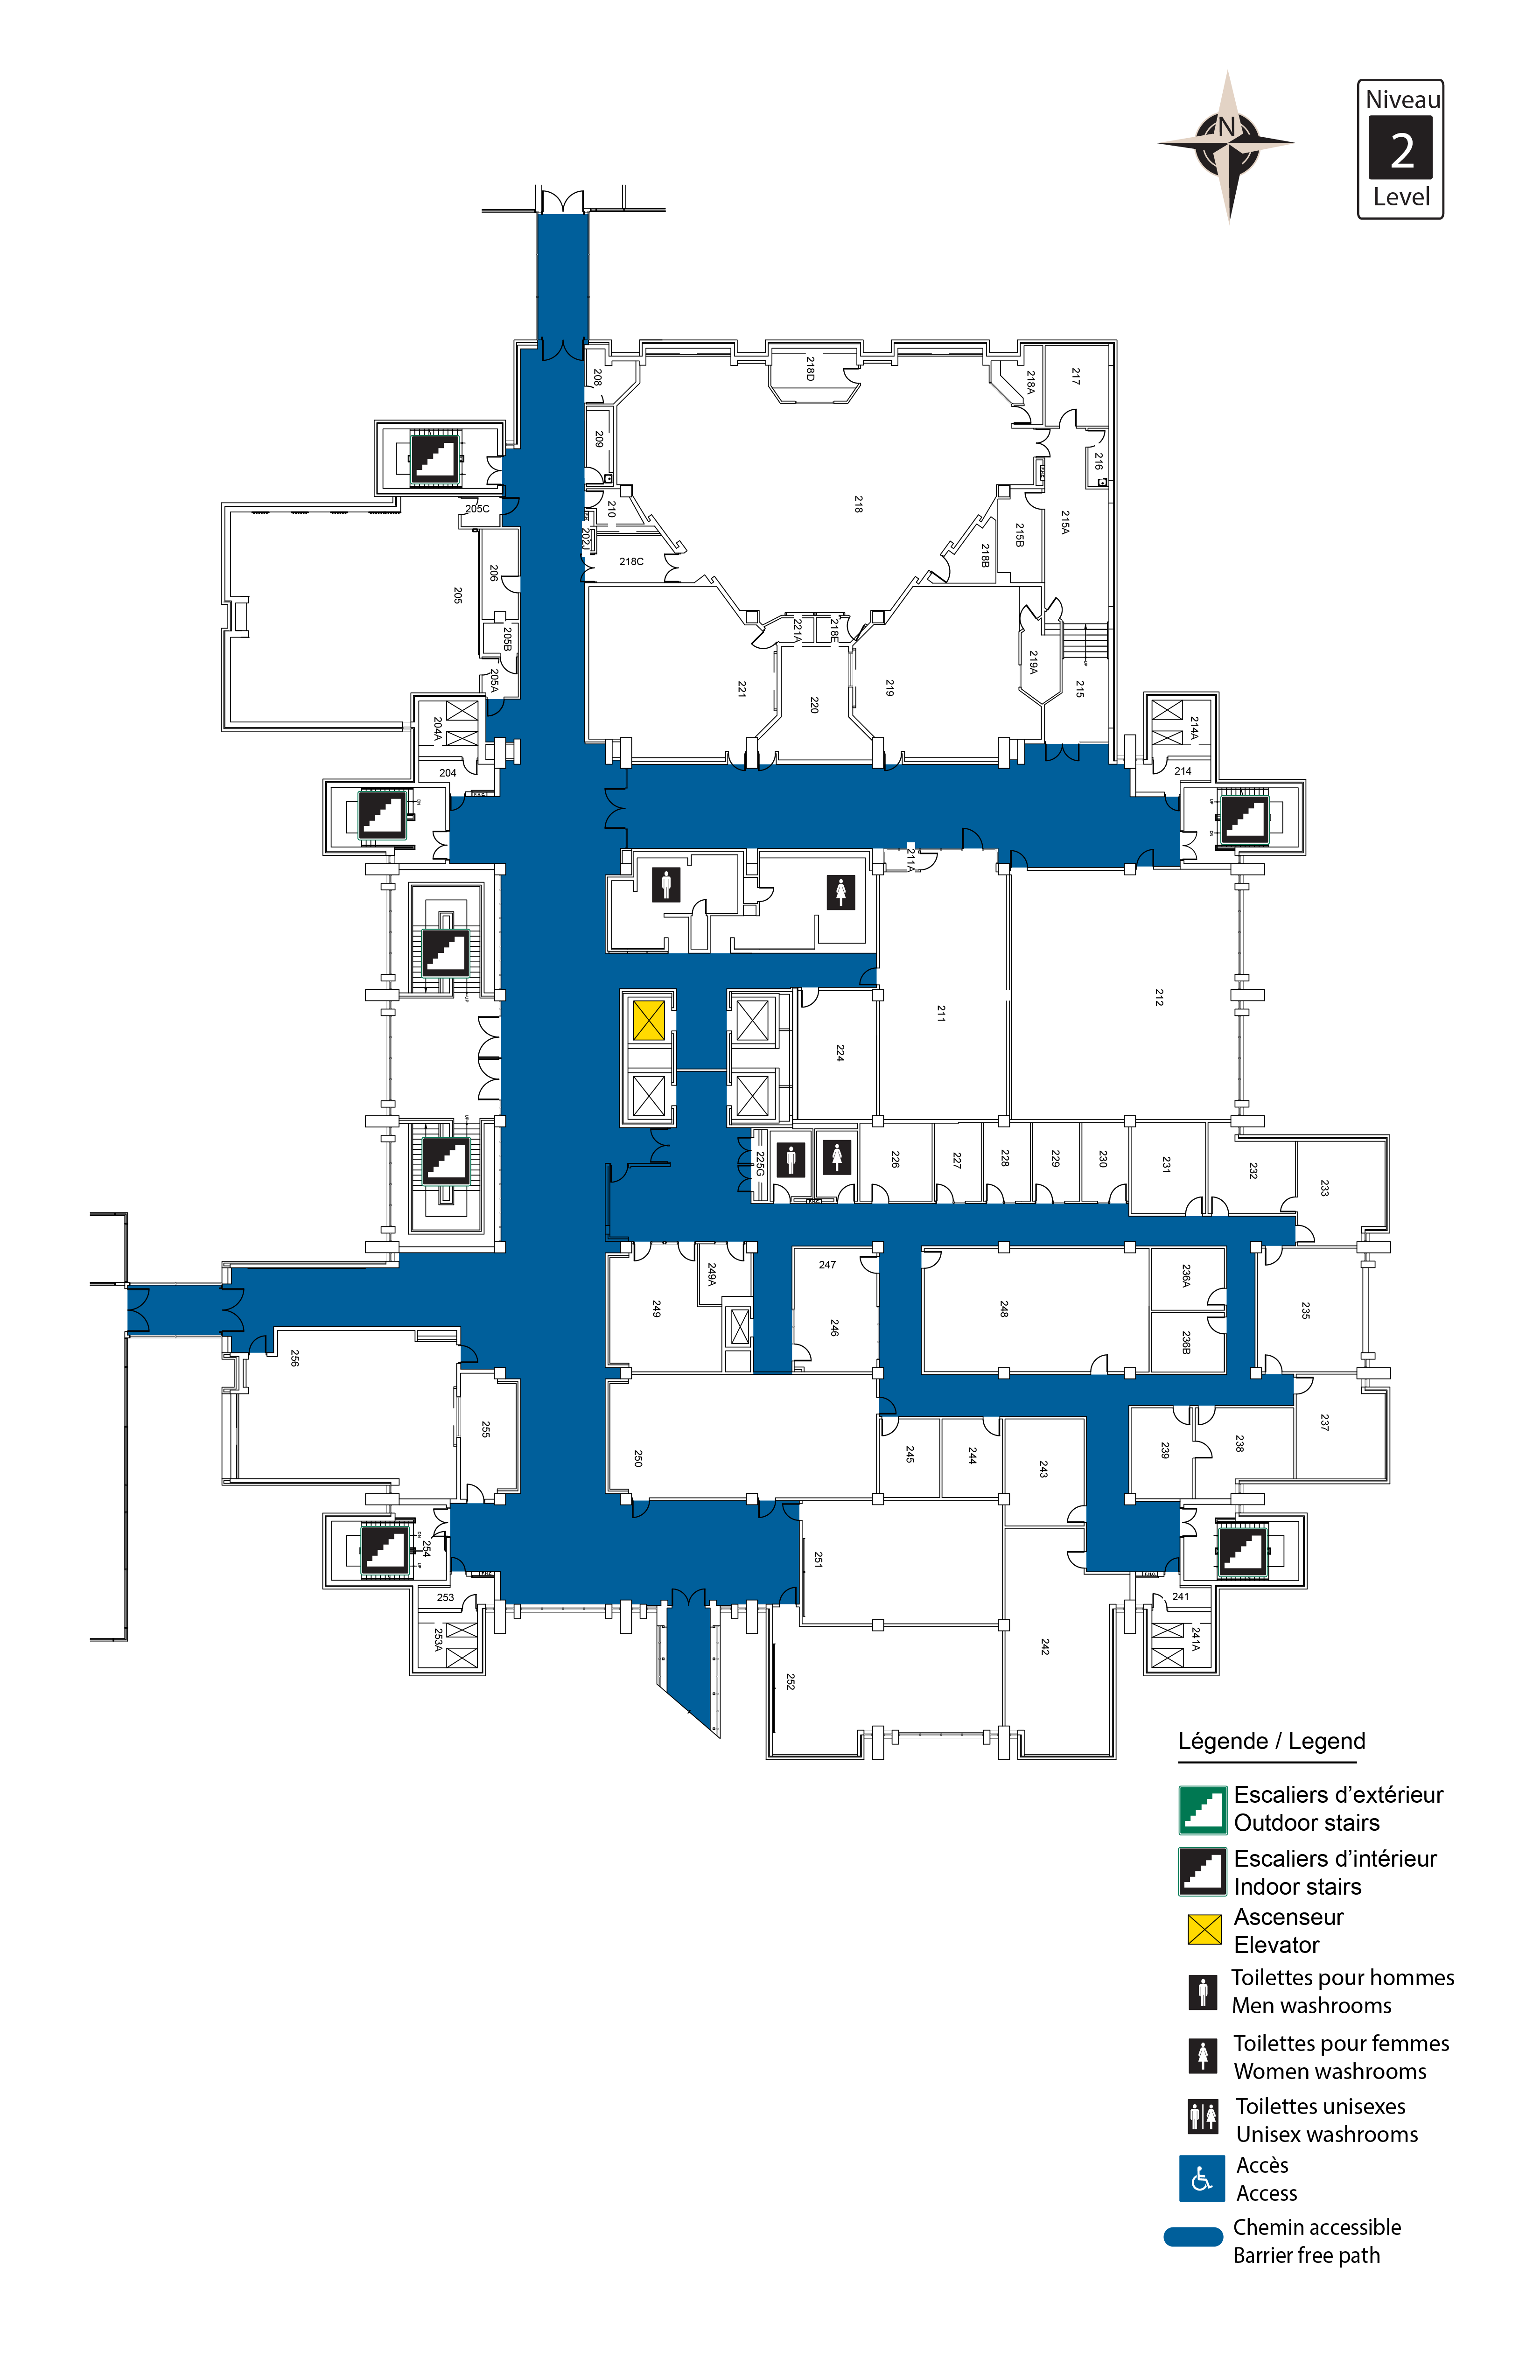 Accessible map - Morisset 2